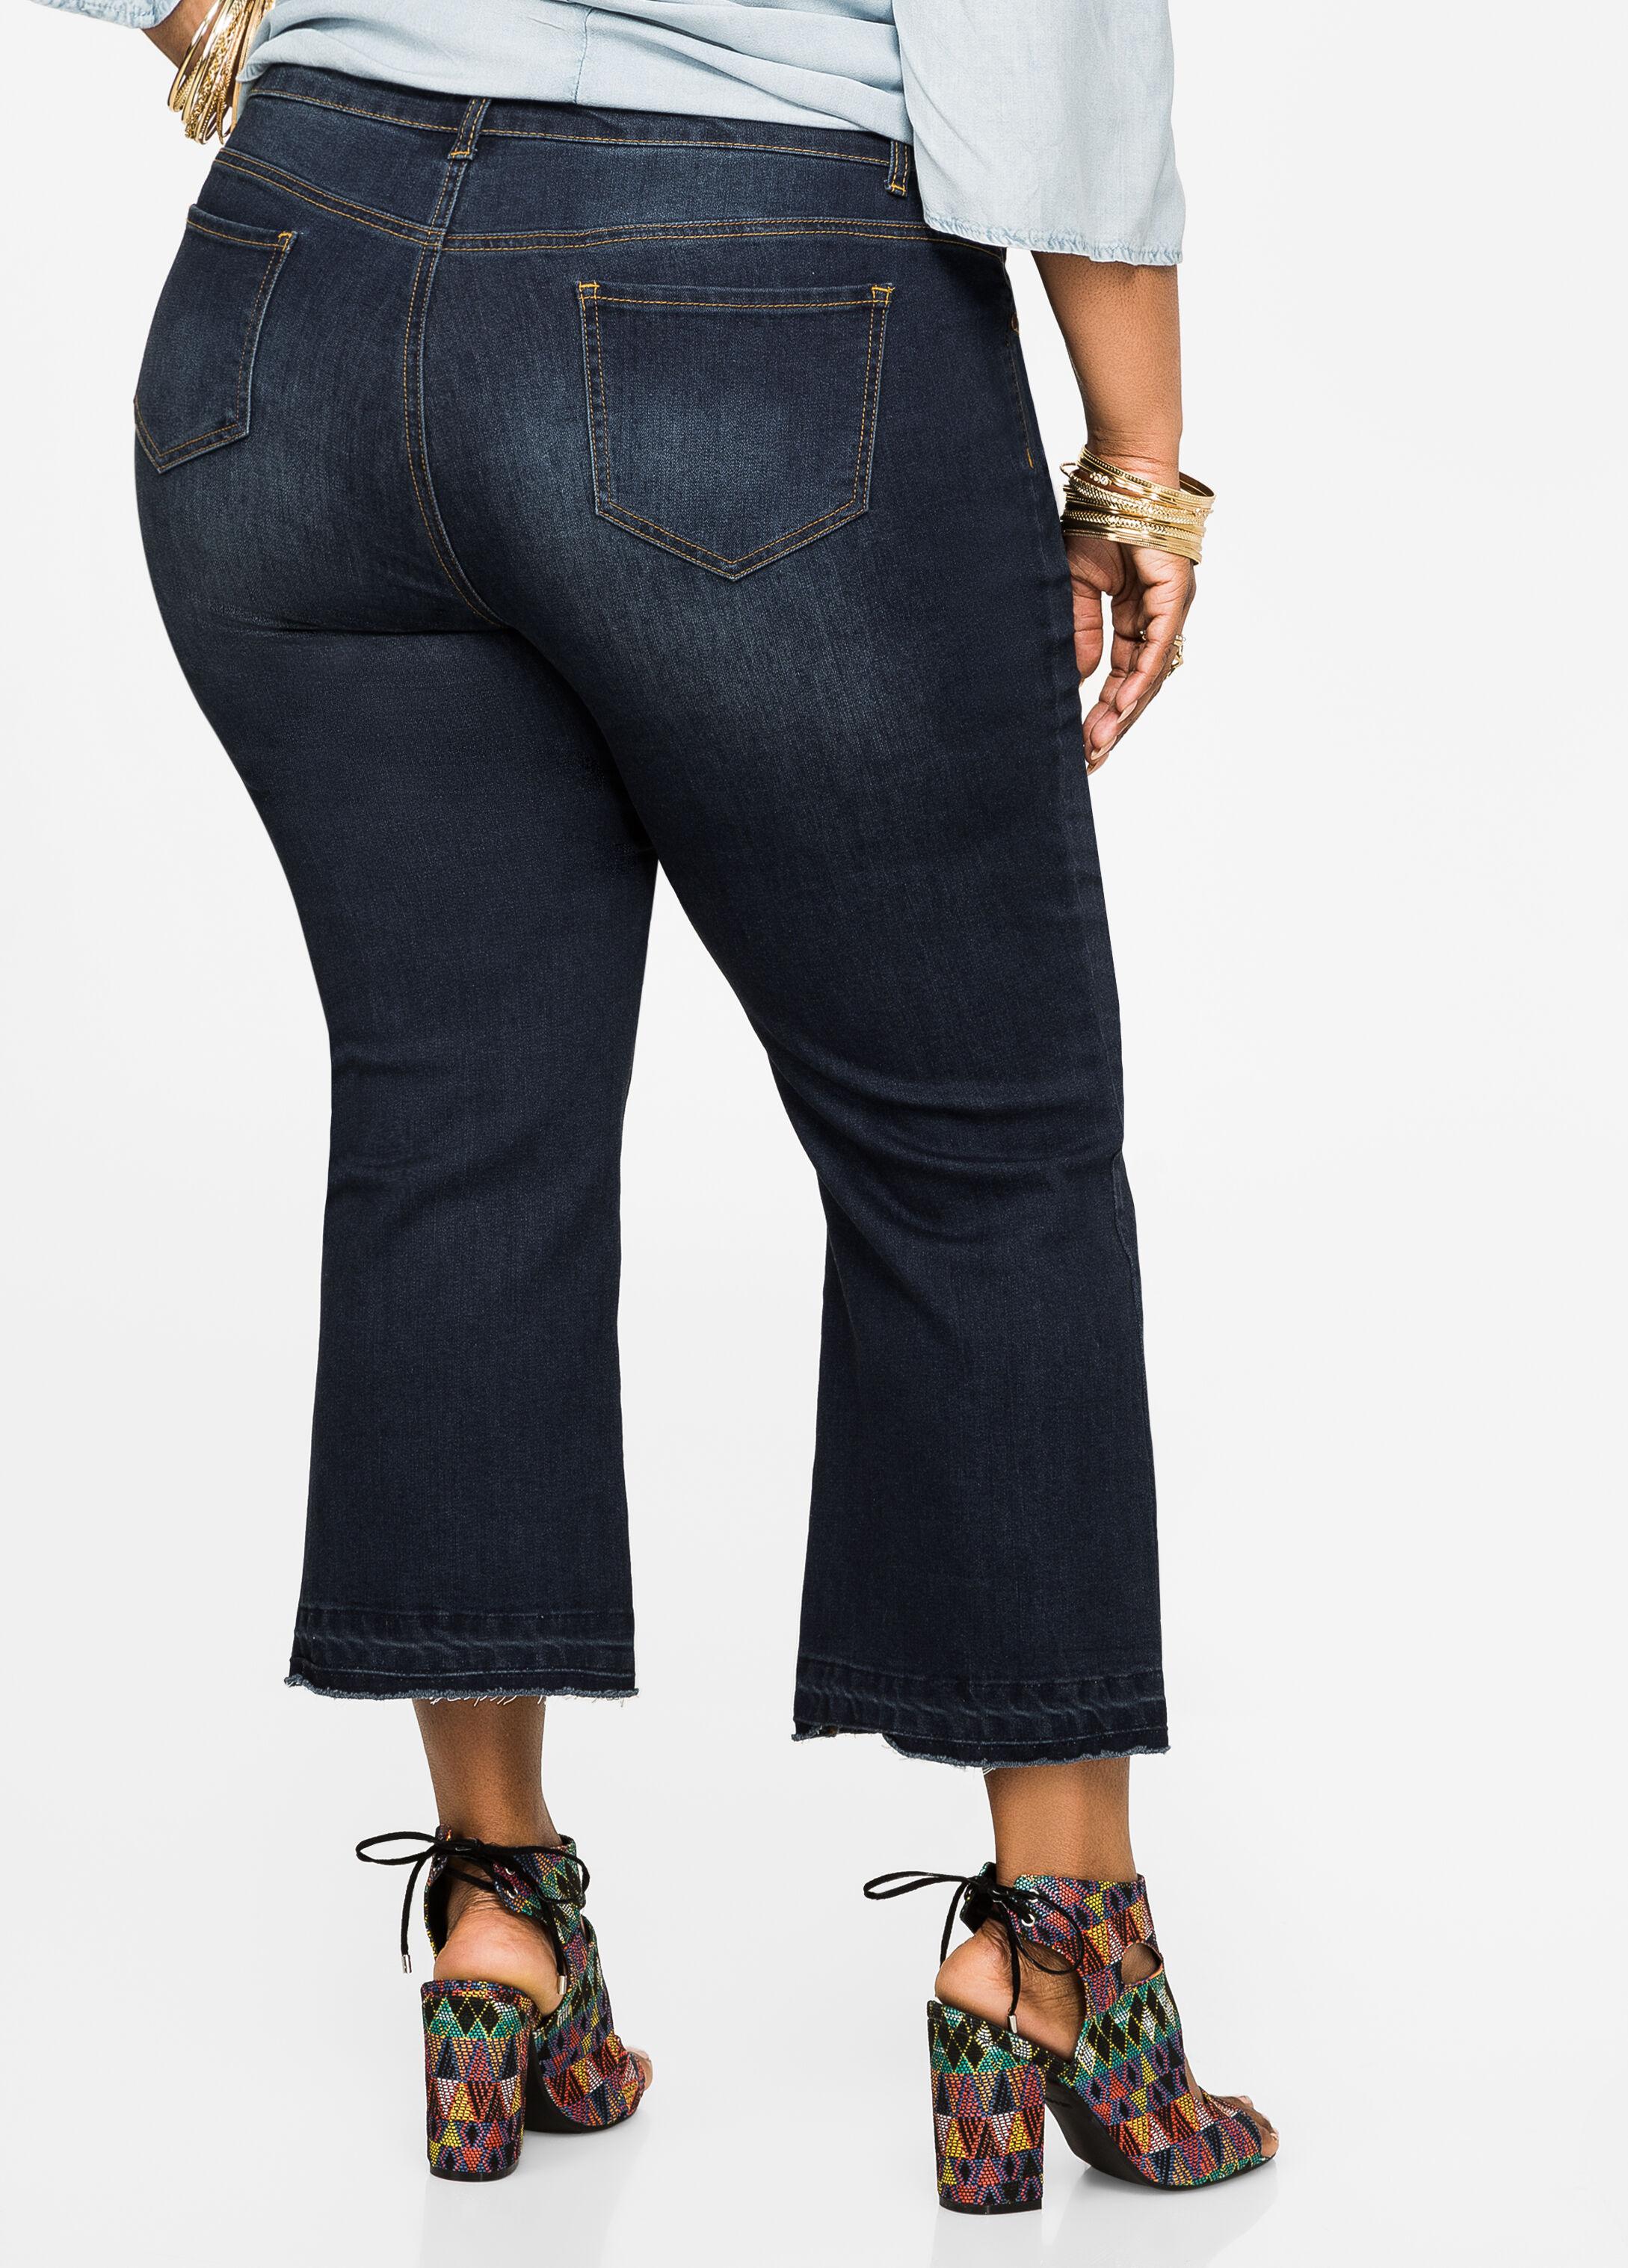 plus size jeans denim cropped kick flare jeans 034 mcl17709p as. Black Bedroom Furniture Sets. Home Design Ideas